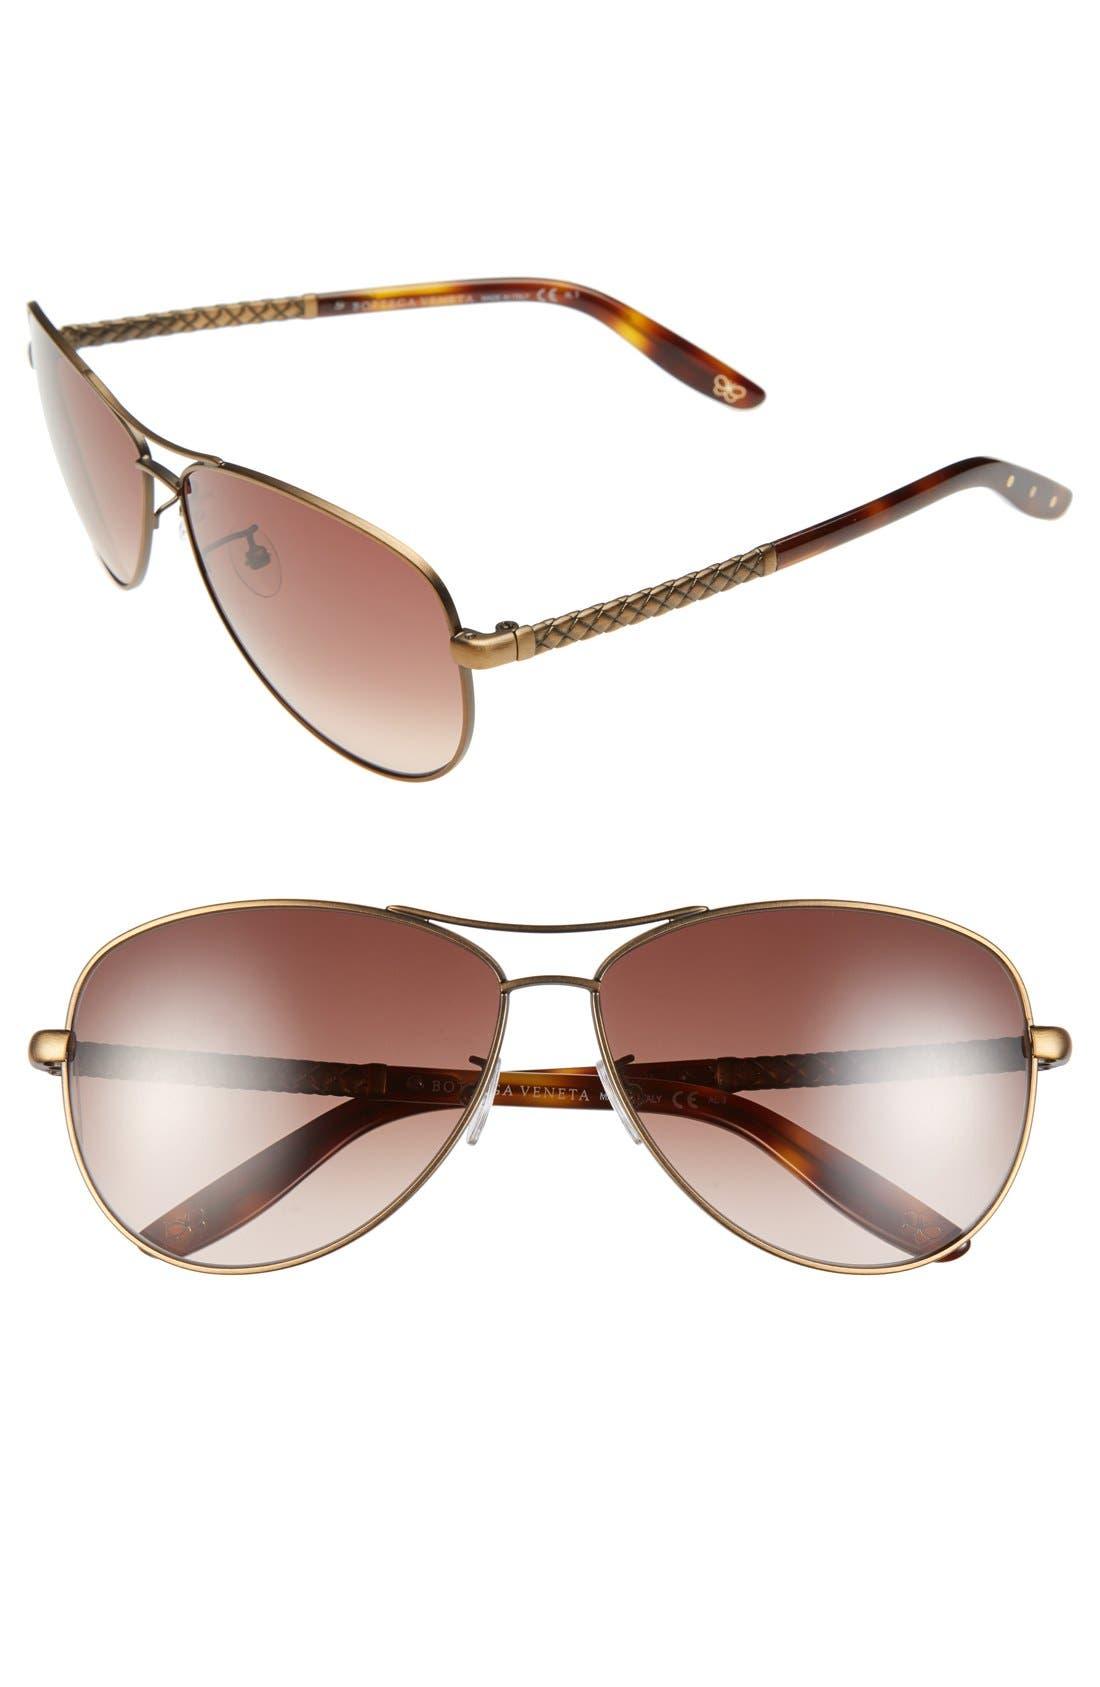 Main Image - Bottega Veneta 61mm Special Fit Aviator Sunglasses